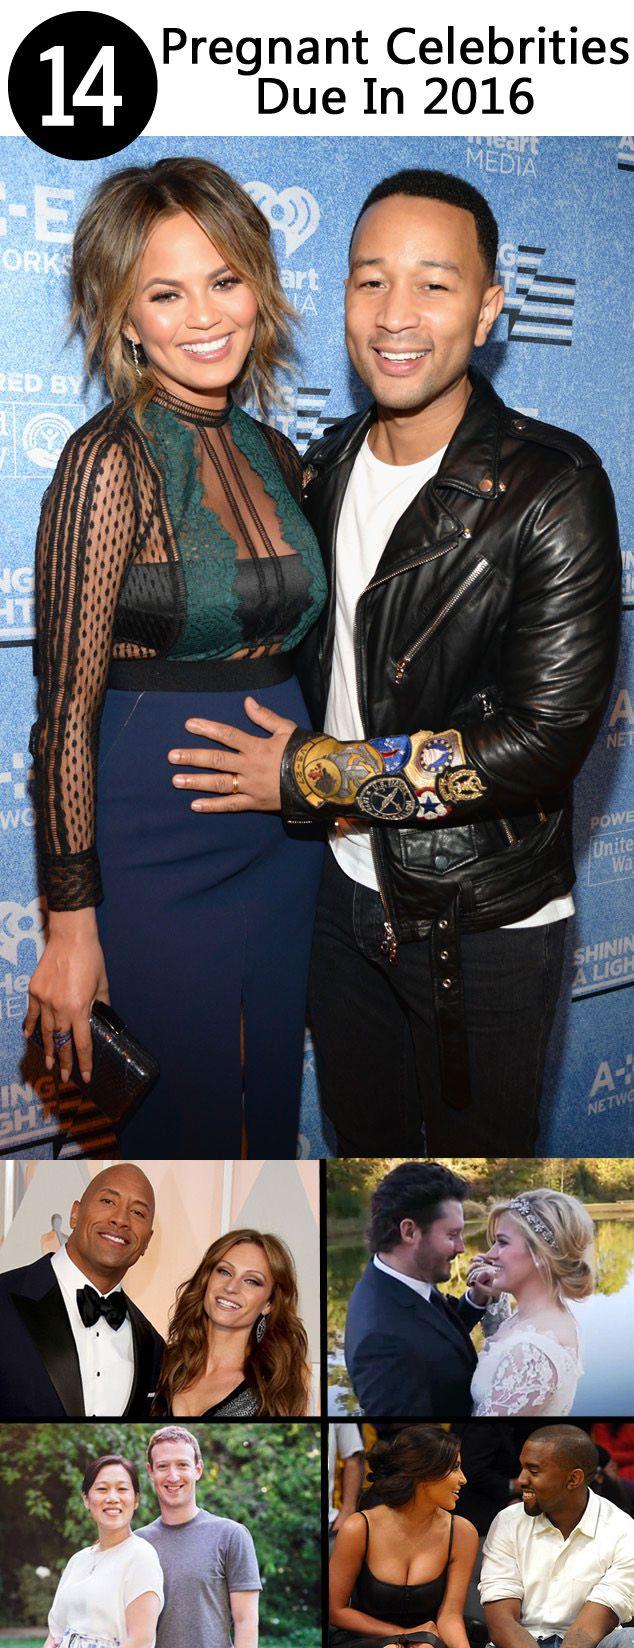 Pregnant Celebrities - Jessica Simpson leaving Bowery